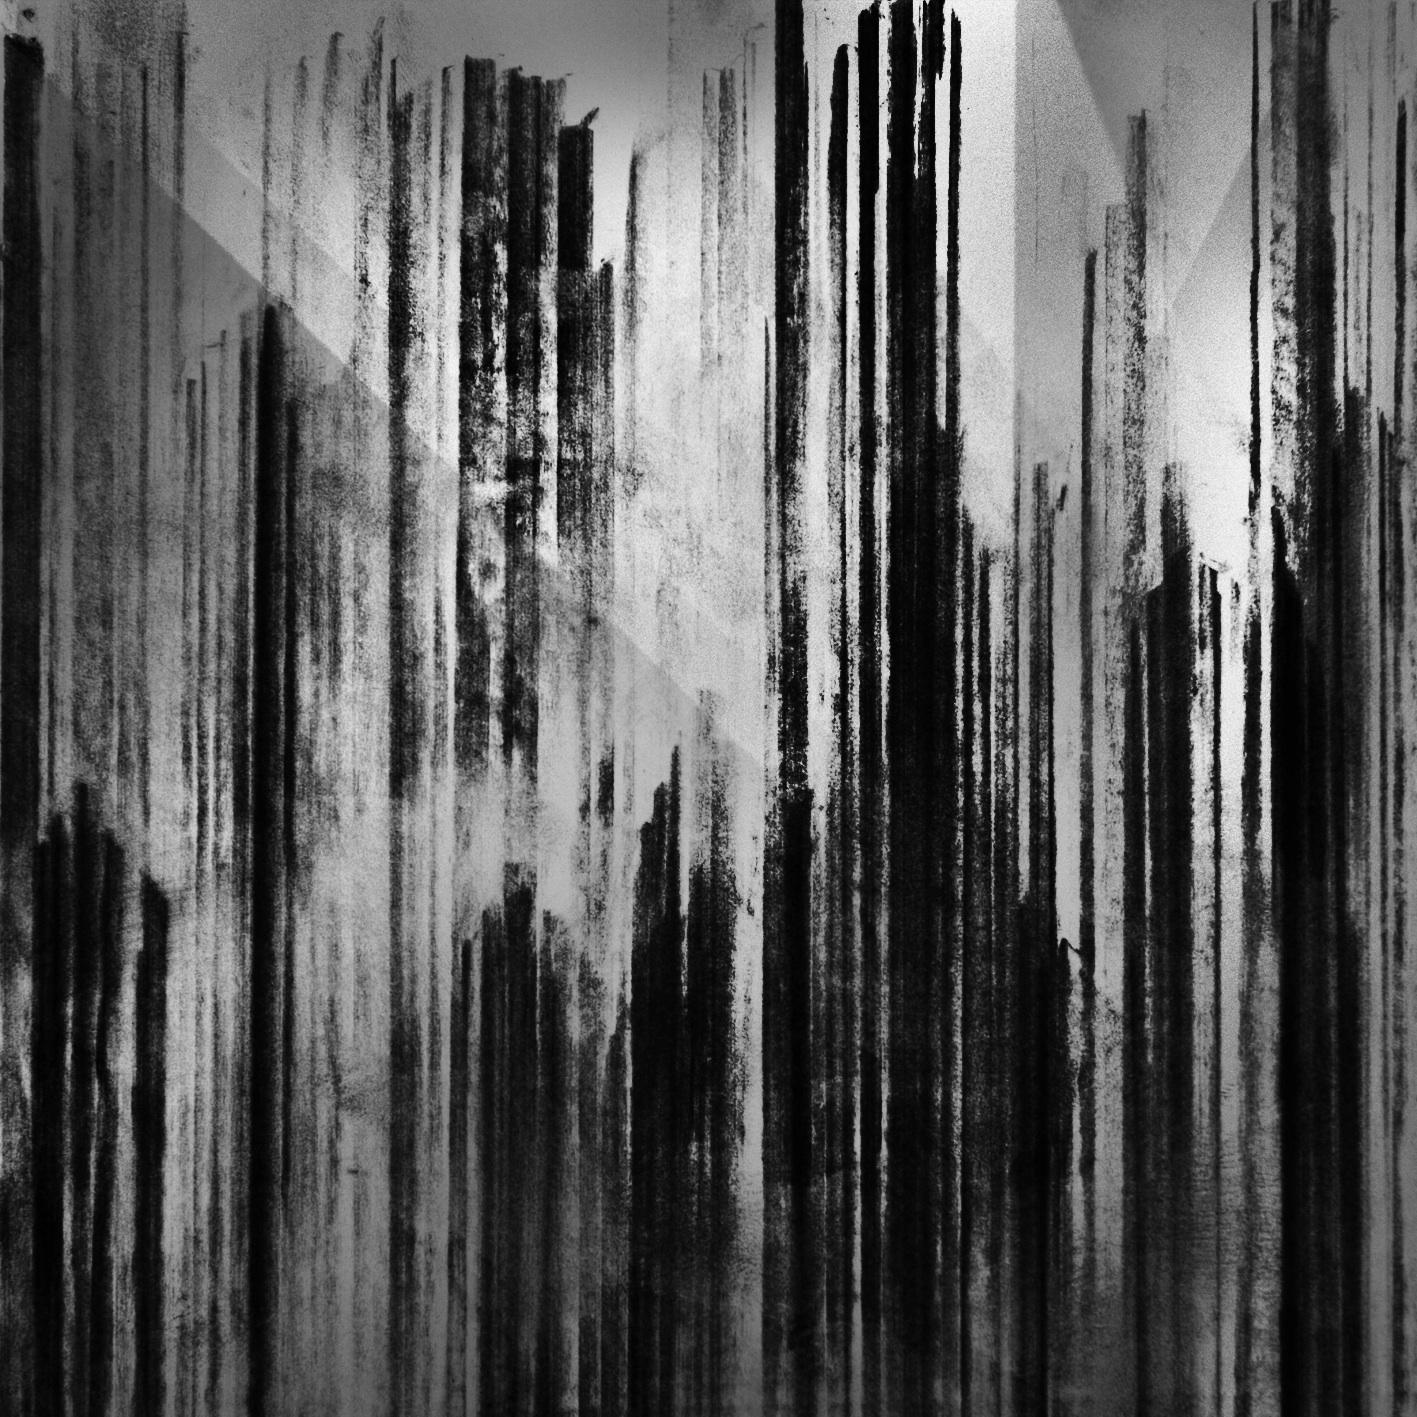 Cult of Luna – Vertikal Review